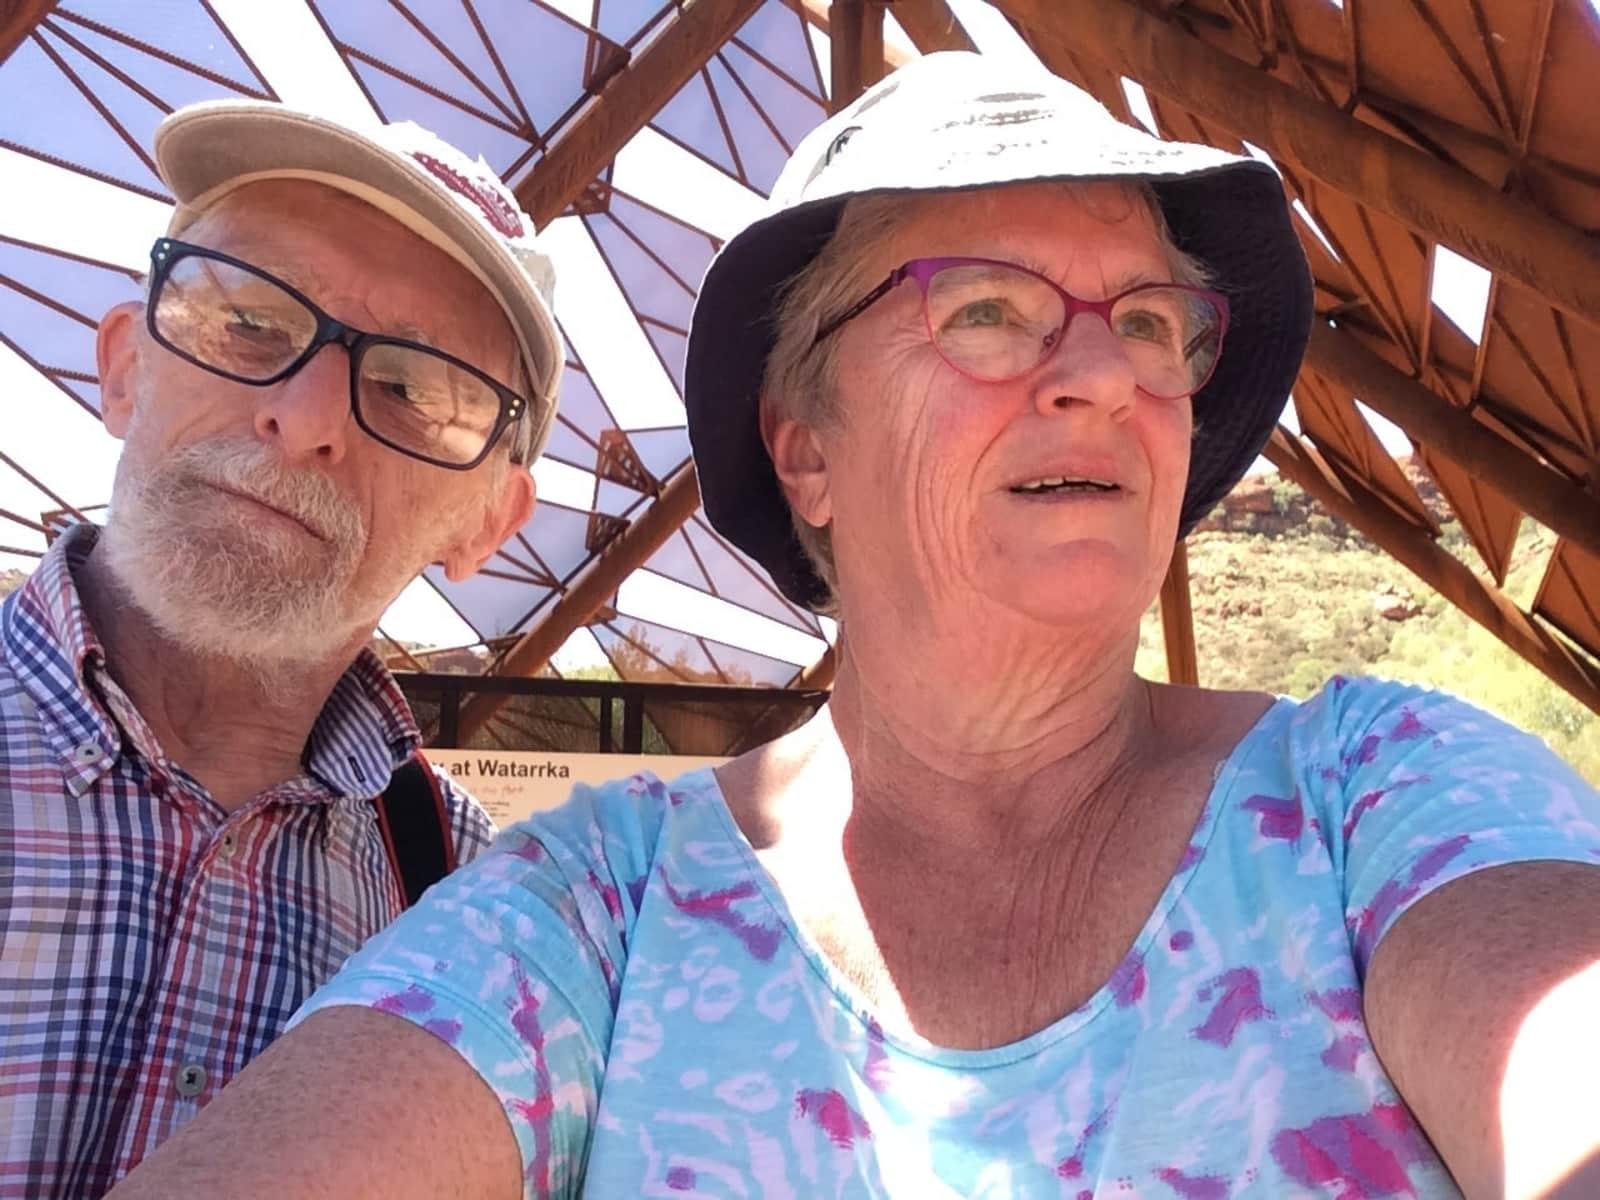 Jane & David from Melbourne, Victoria, Australia